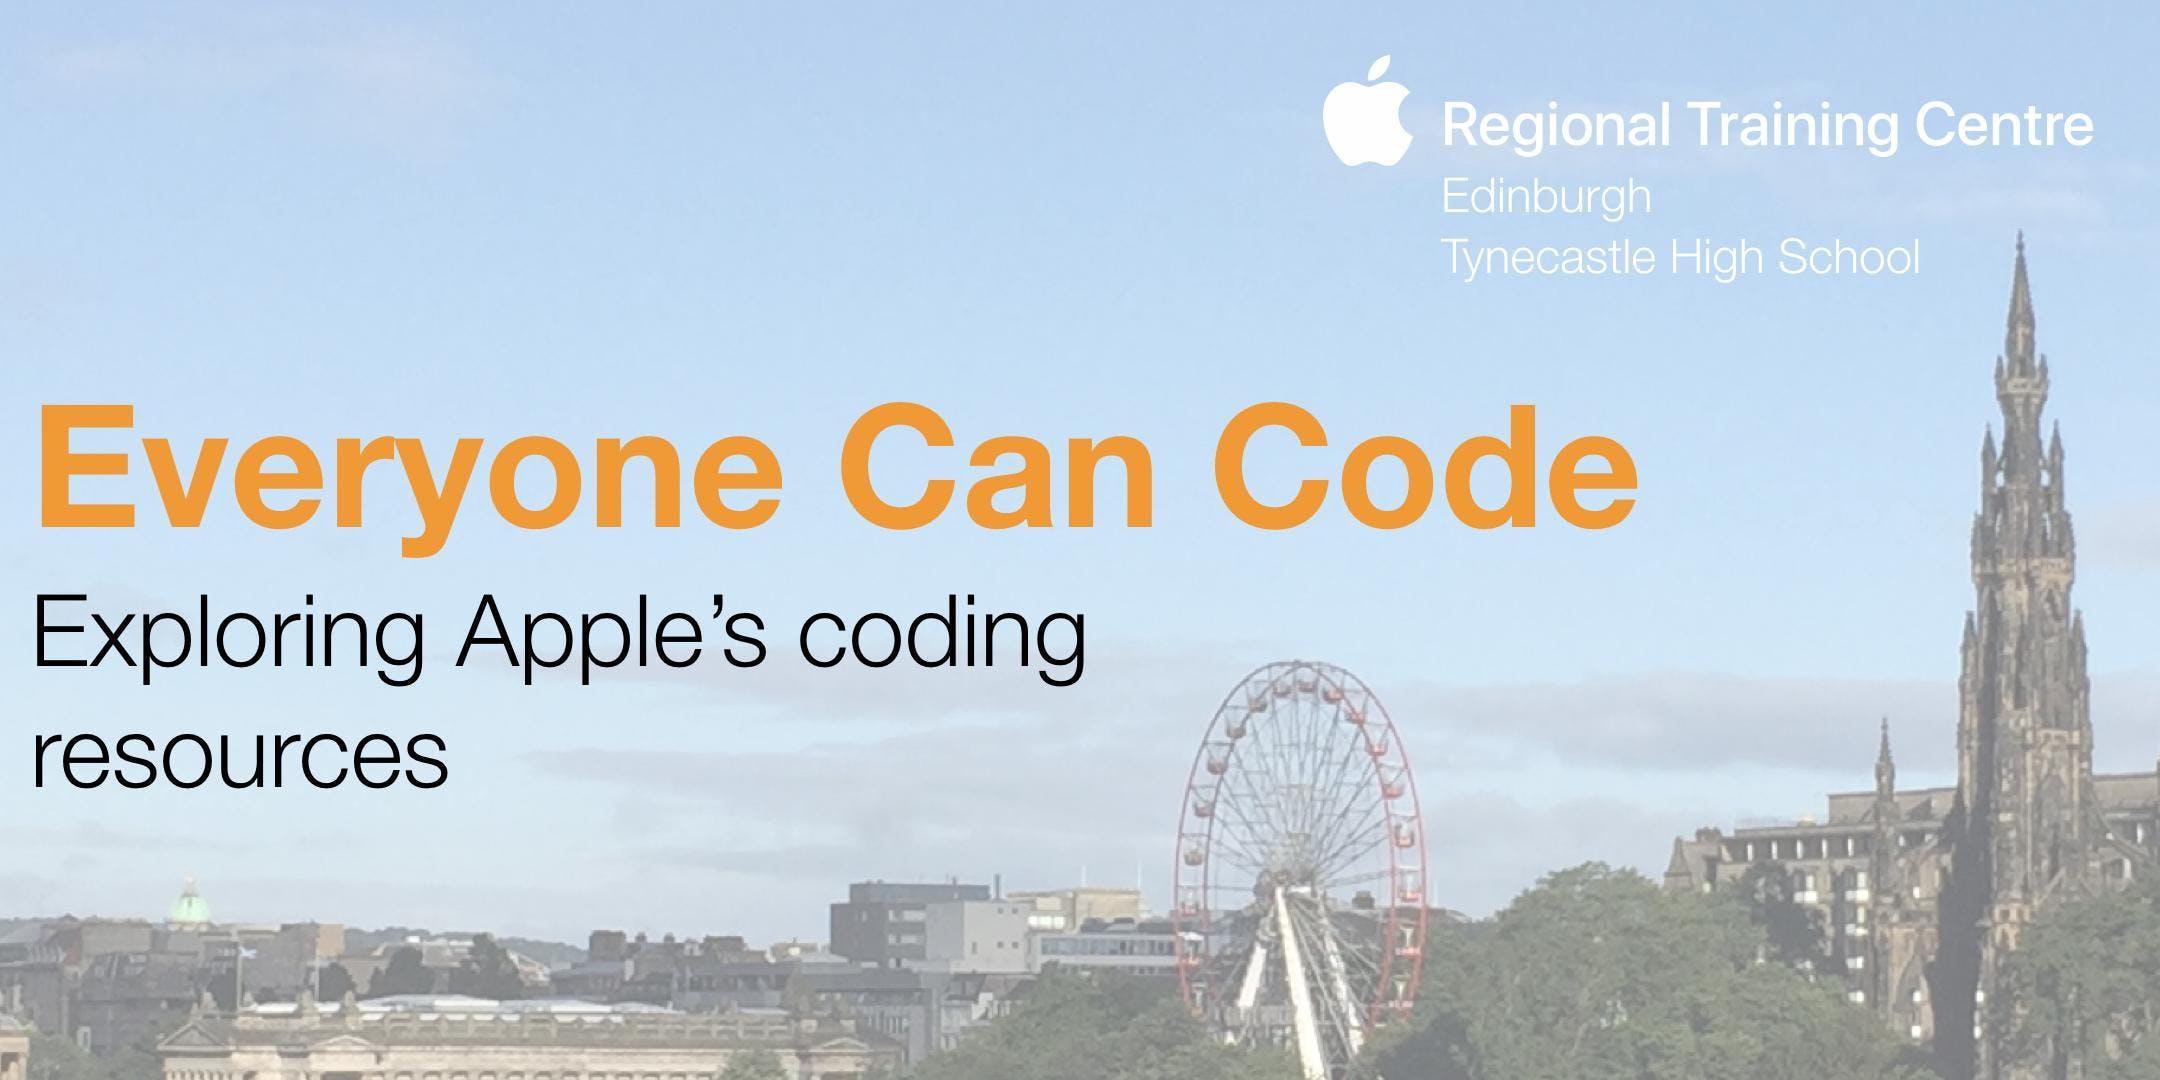 Everyone Can Code